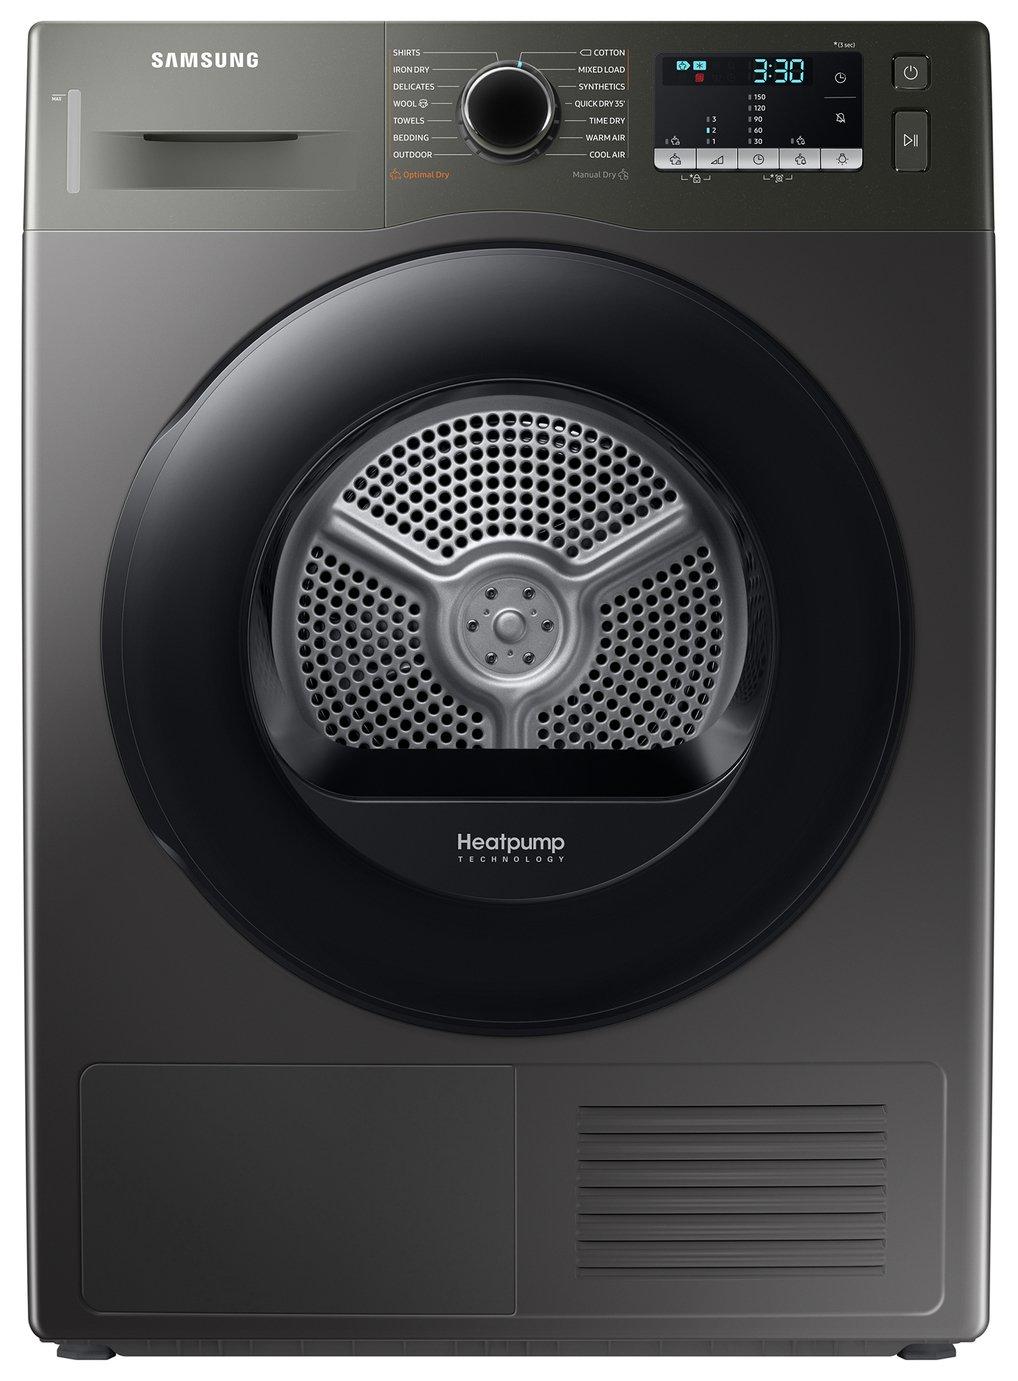 Samsung DV90TA040AX/EU 9KG Heat Pump Tumble Dryer - Graphite